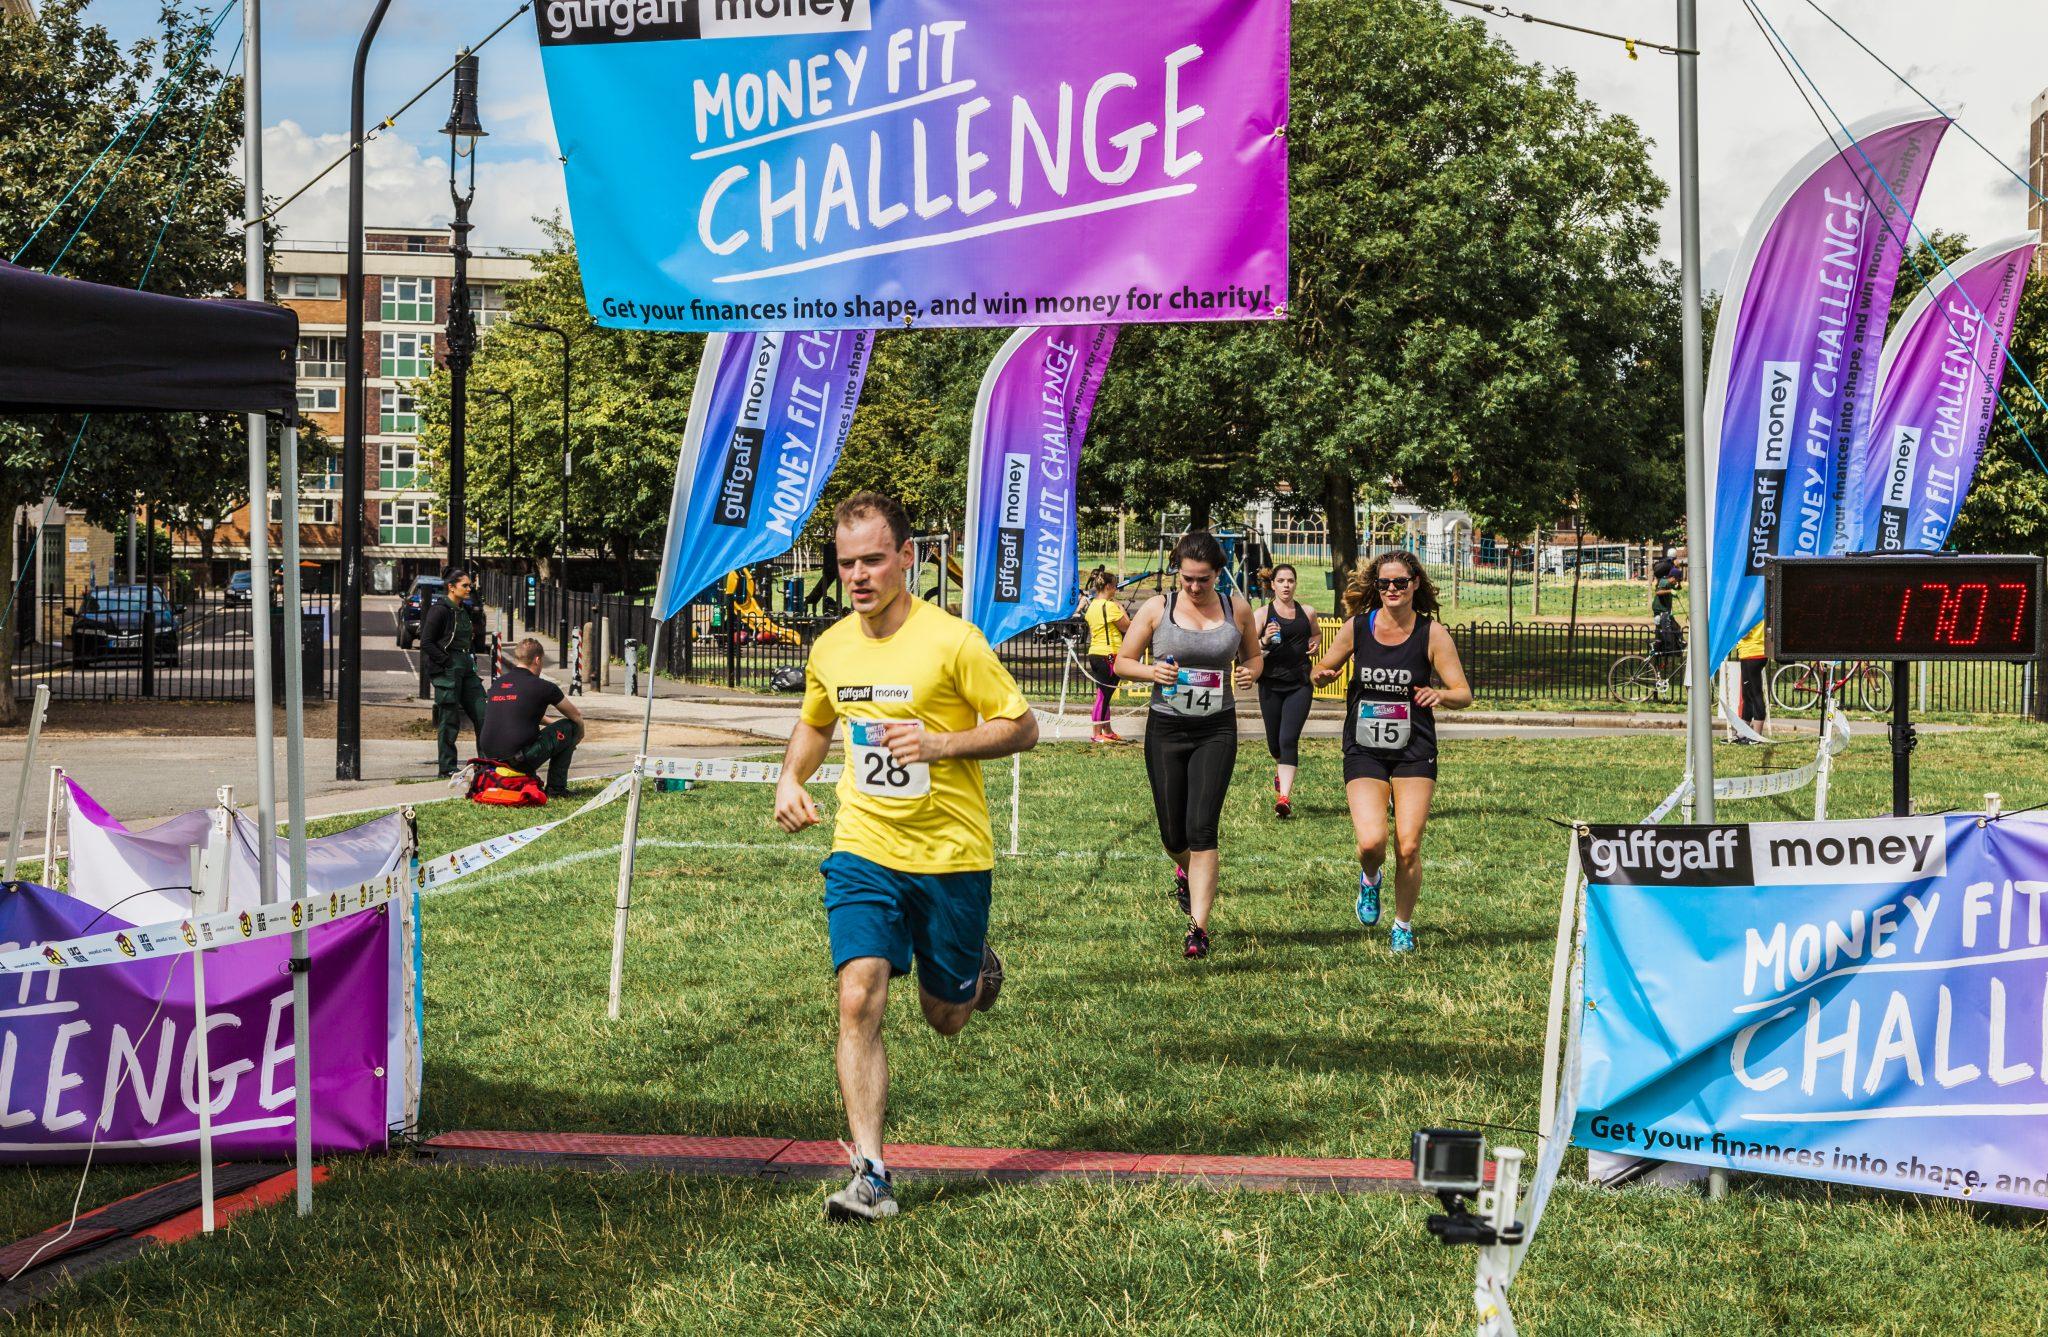 0009 Finish Line - Giff Gaff Money Fit Challenge